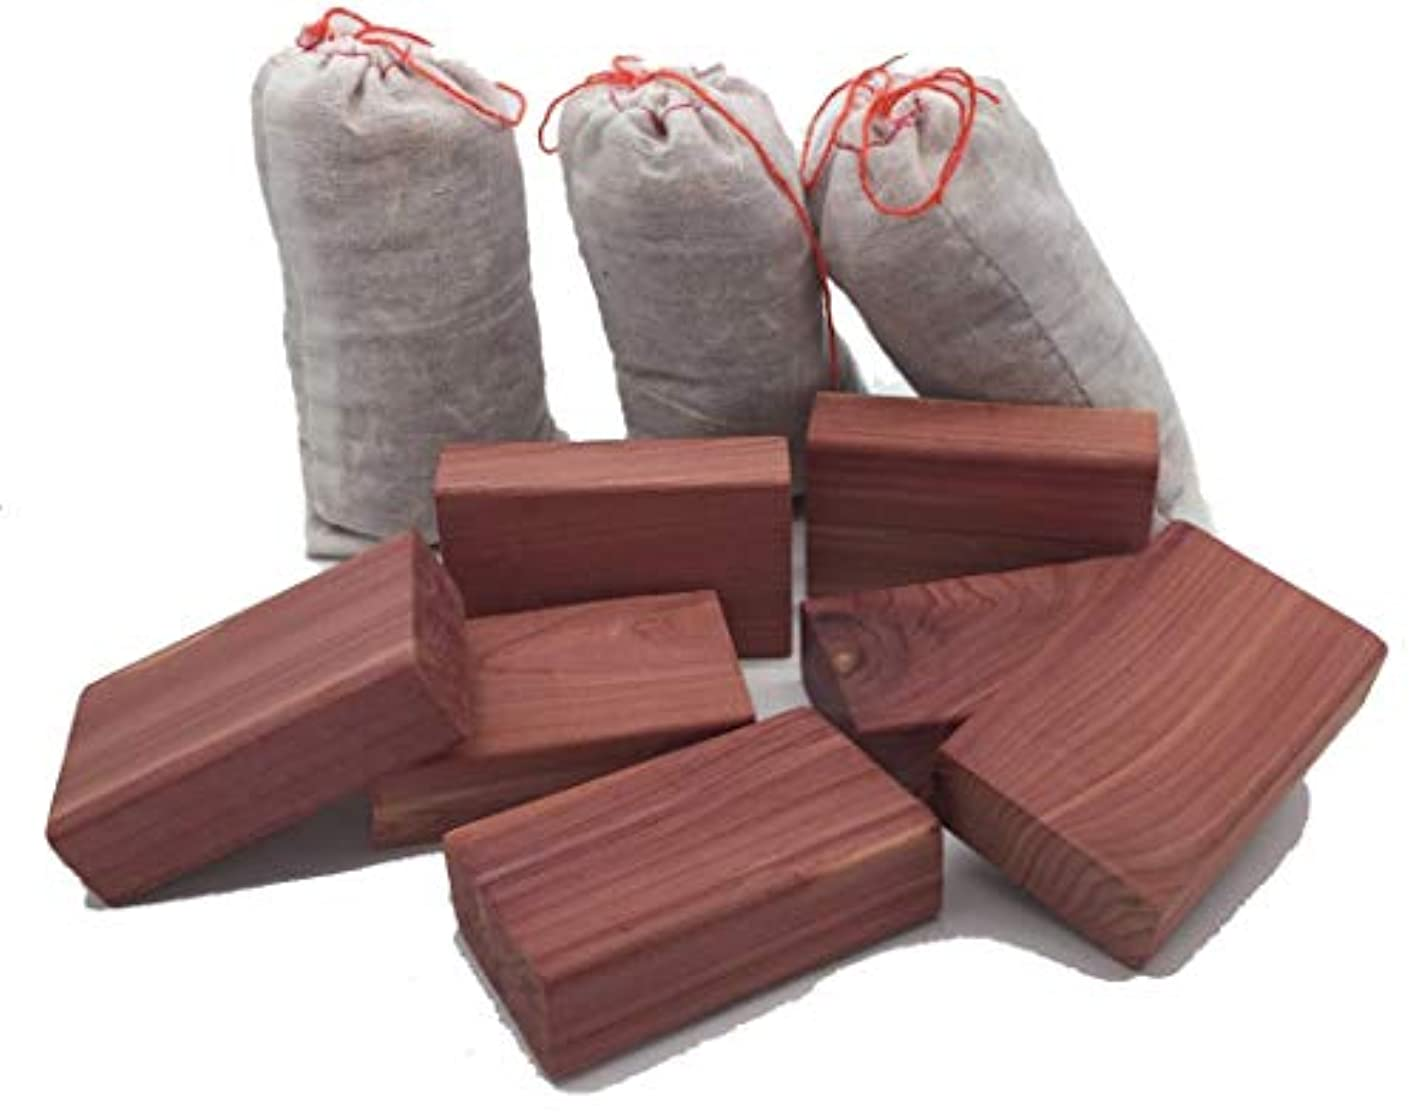 PTCLTRAPS8 Closet Essentials Red Cedar Blocks and Cedar Sachet Clothes Protector Moth Repellent Storage Accessories Value Pack (10 Items)